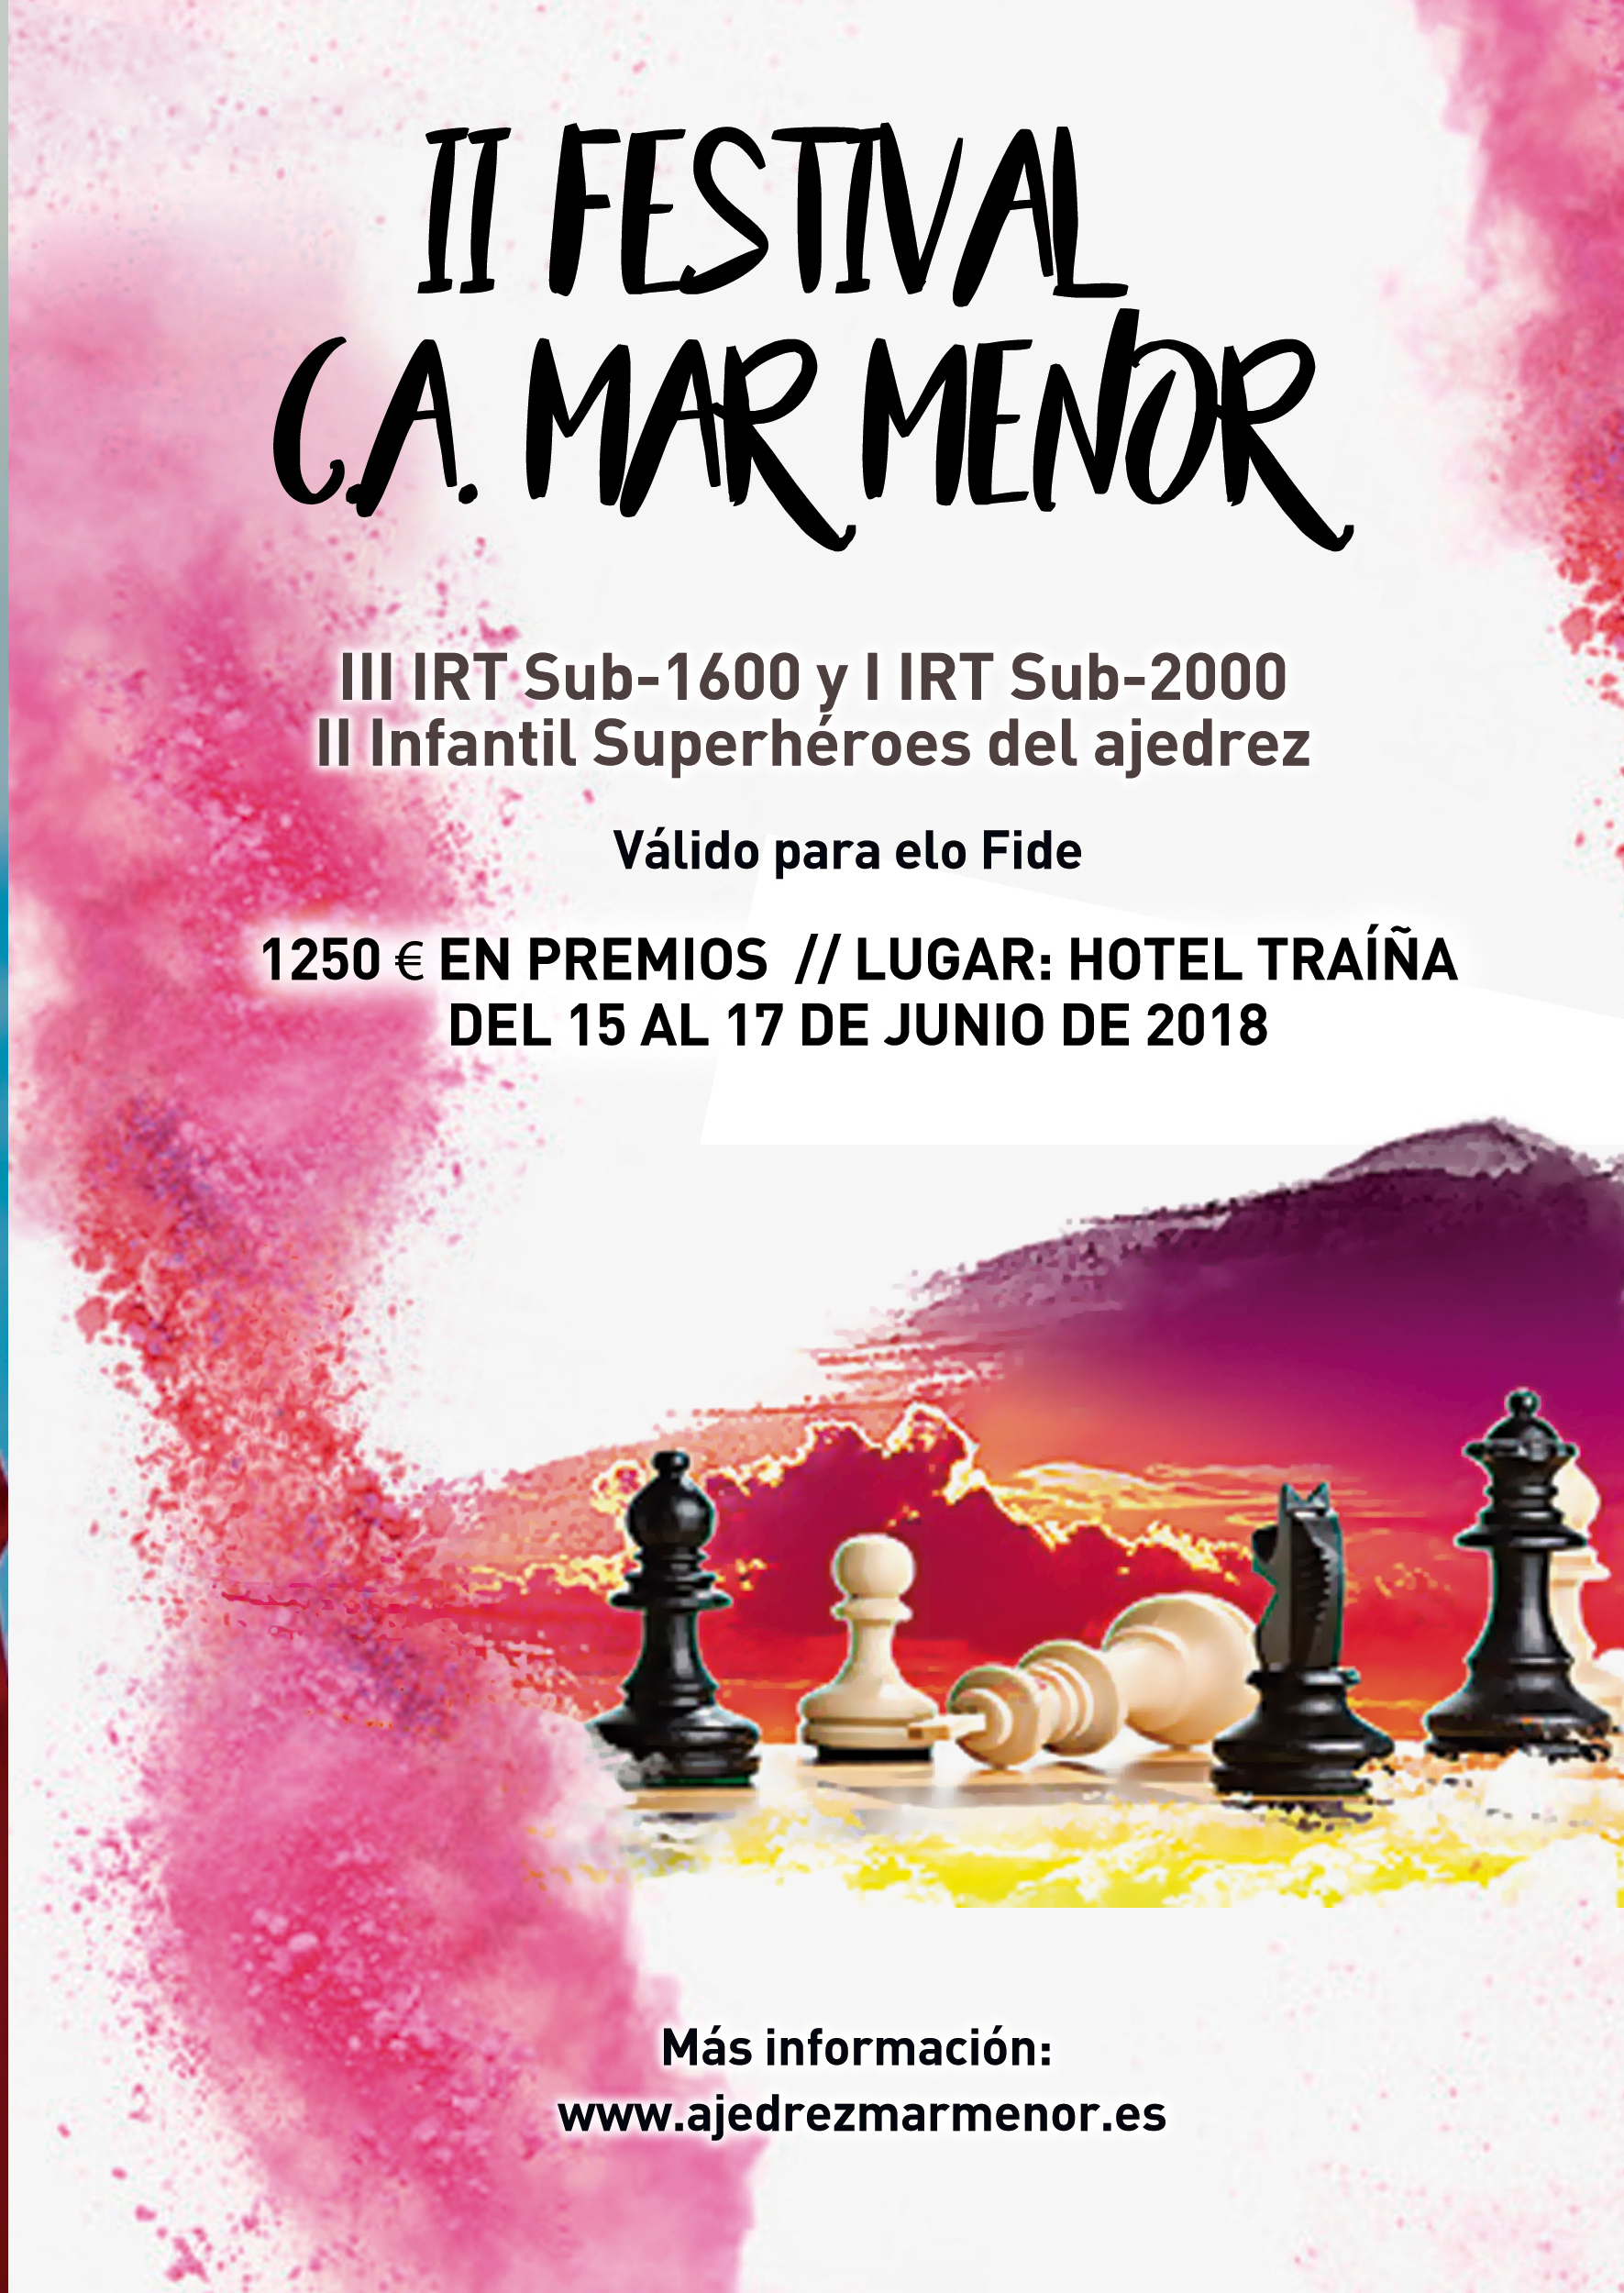 III Festival C.A. Mar Menor